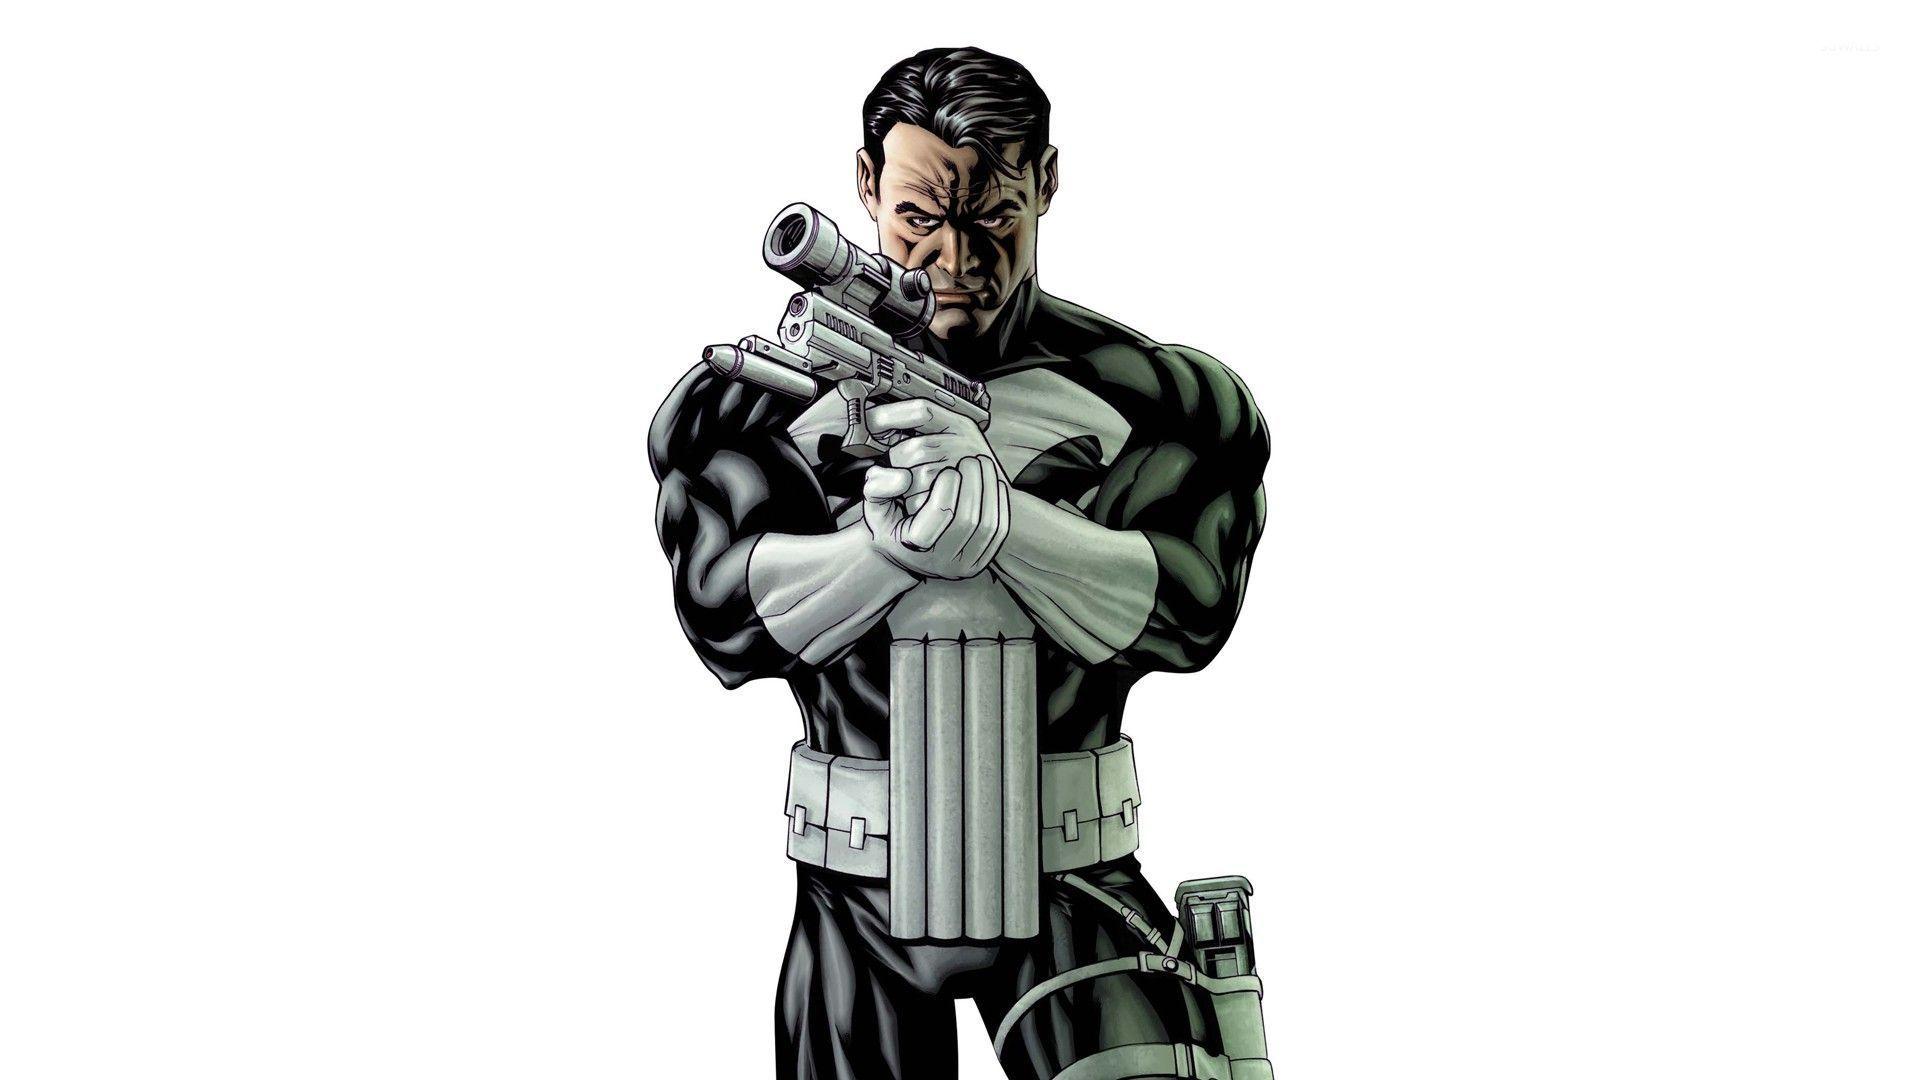 Amazing Wallpaper Marvel Punisher - punisher-with-a-gun-50342-1920x1080  Image_4857.jpg